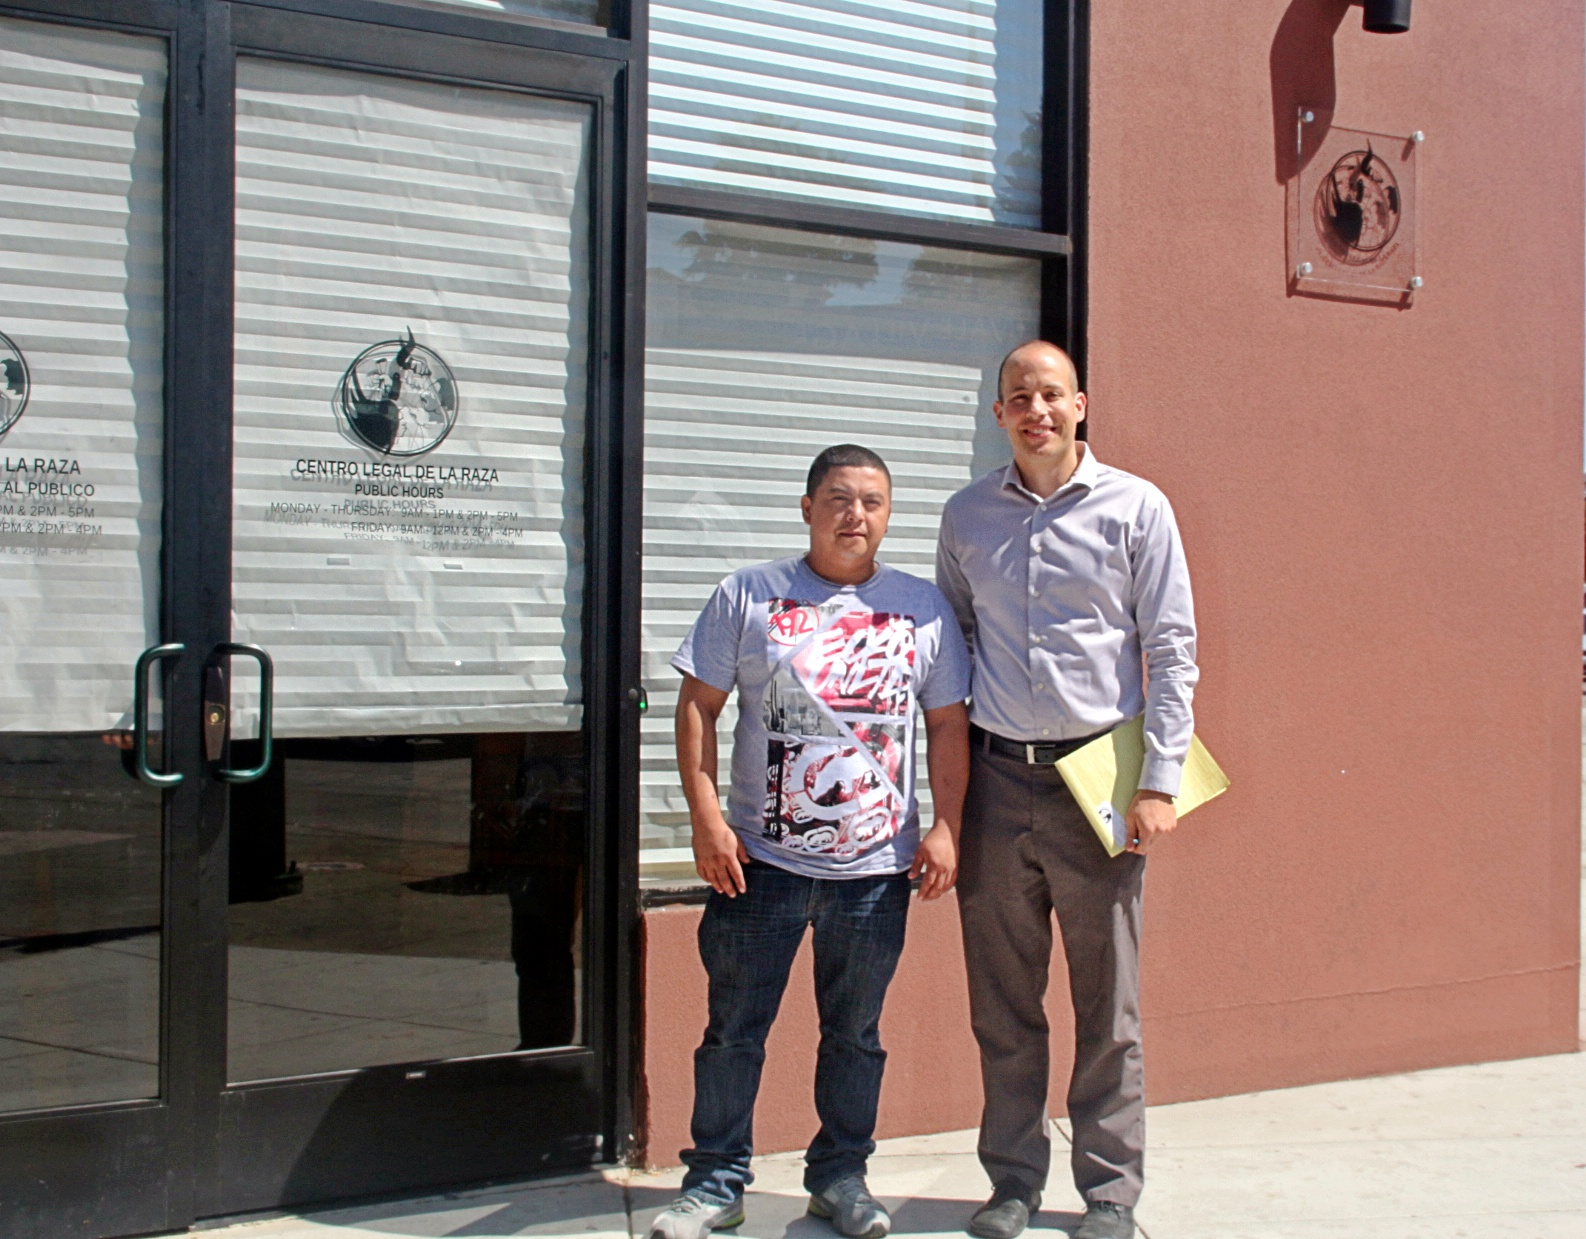 William Navarette with his attorney Jesse Newmark infront of Centro Legal de la Raza office in Oakland. Photo by Sana Saleem.